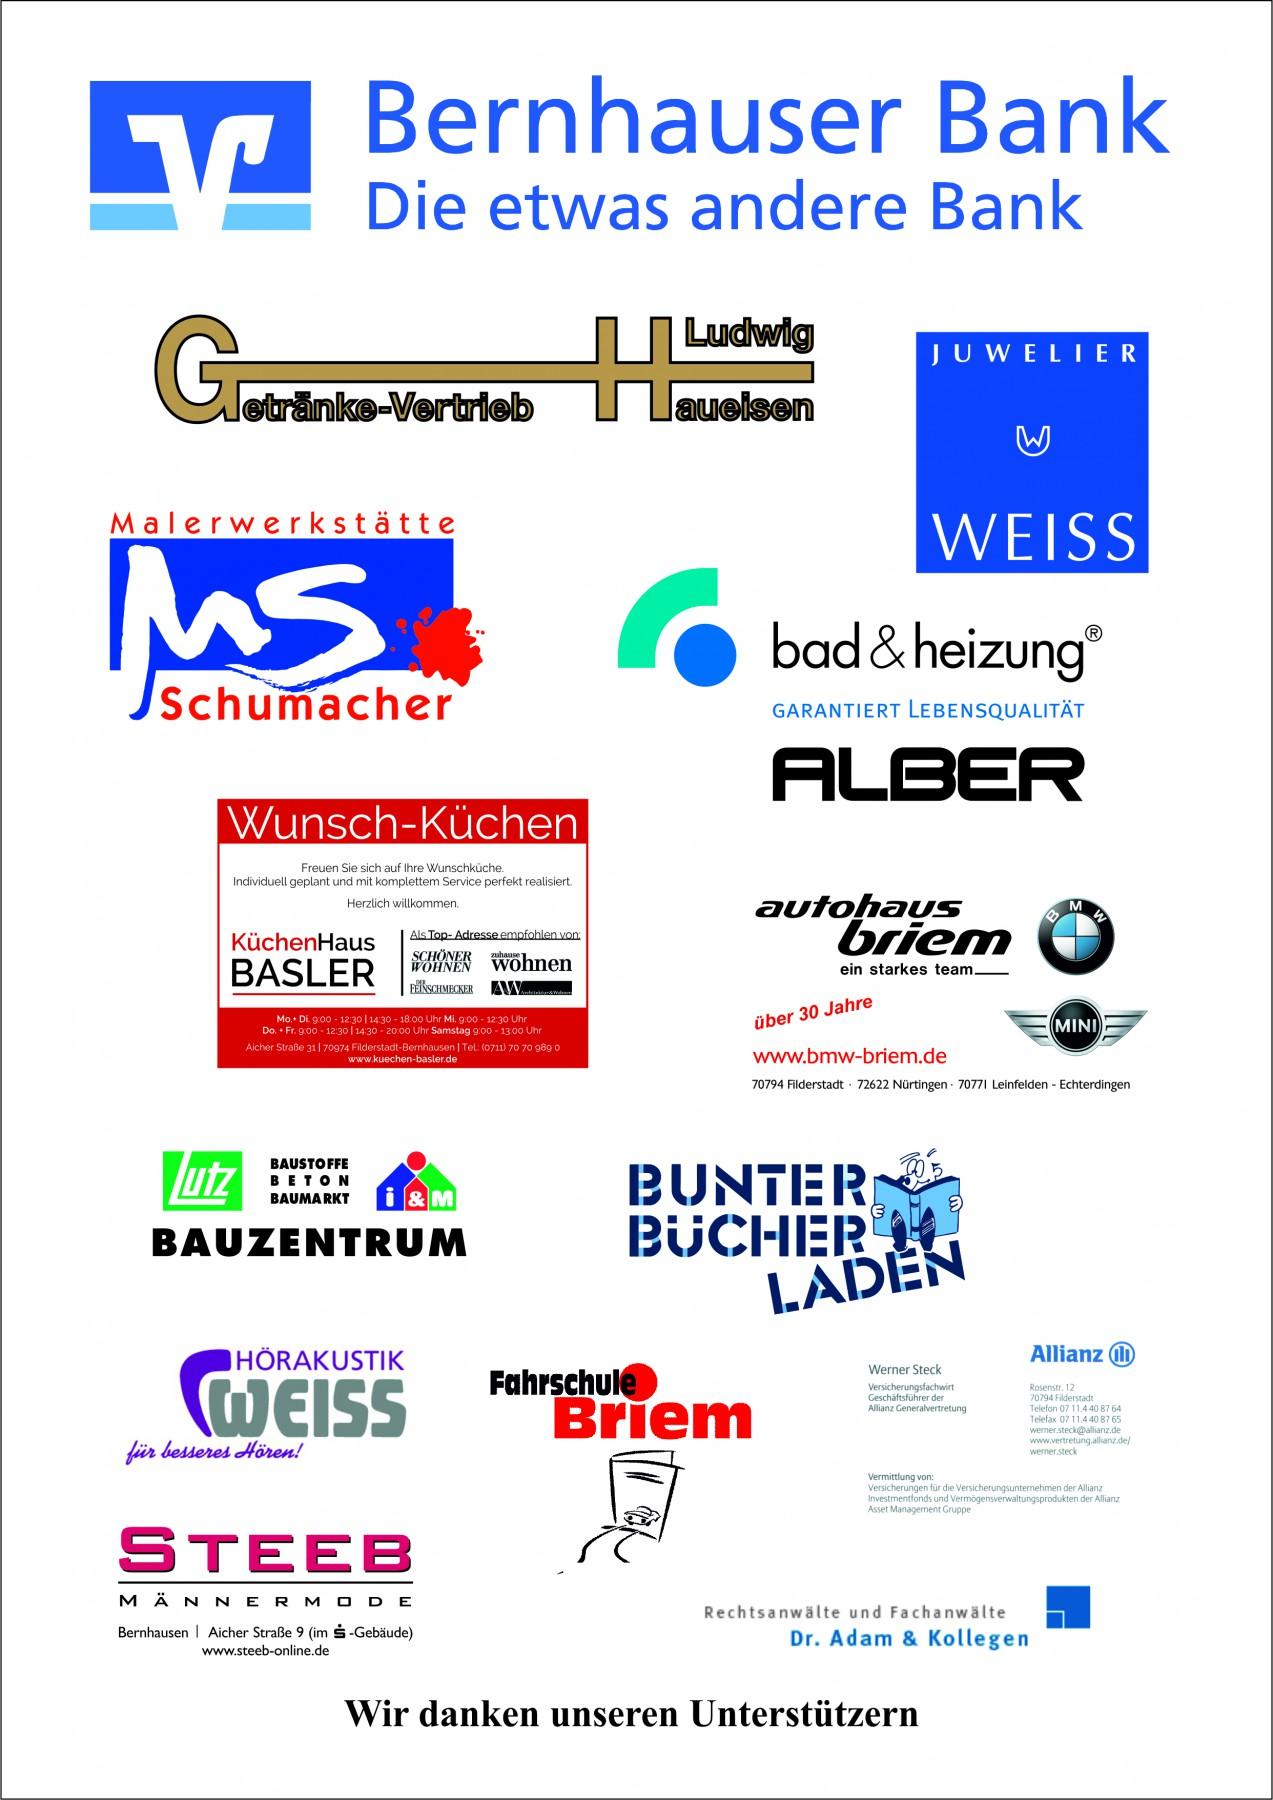 Bernhauser bank online-banking